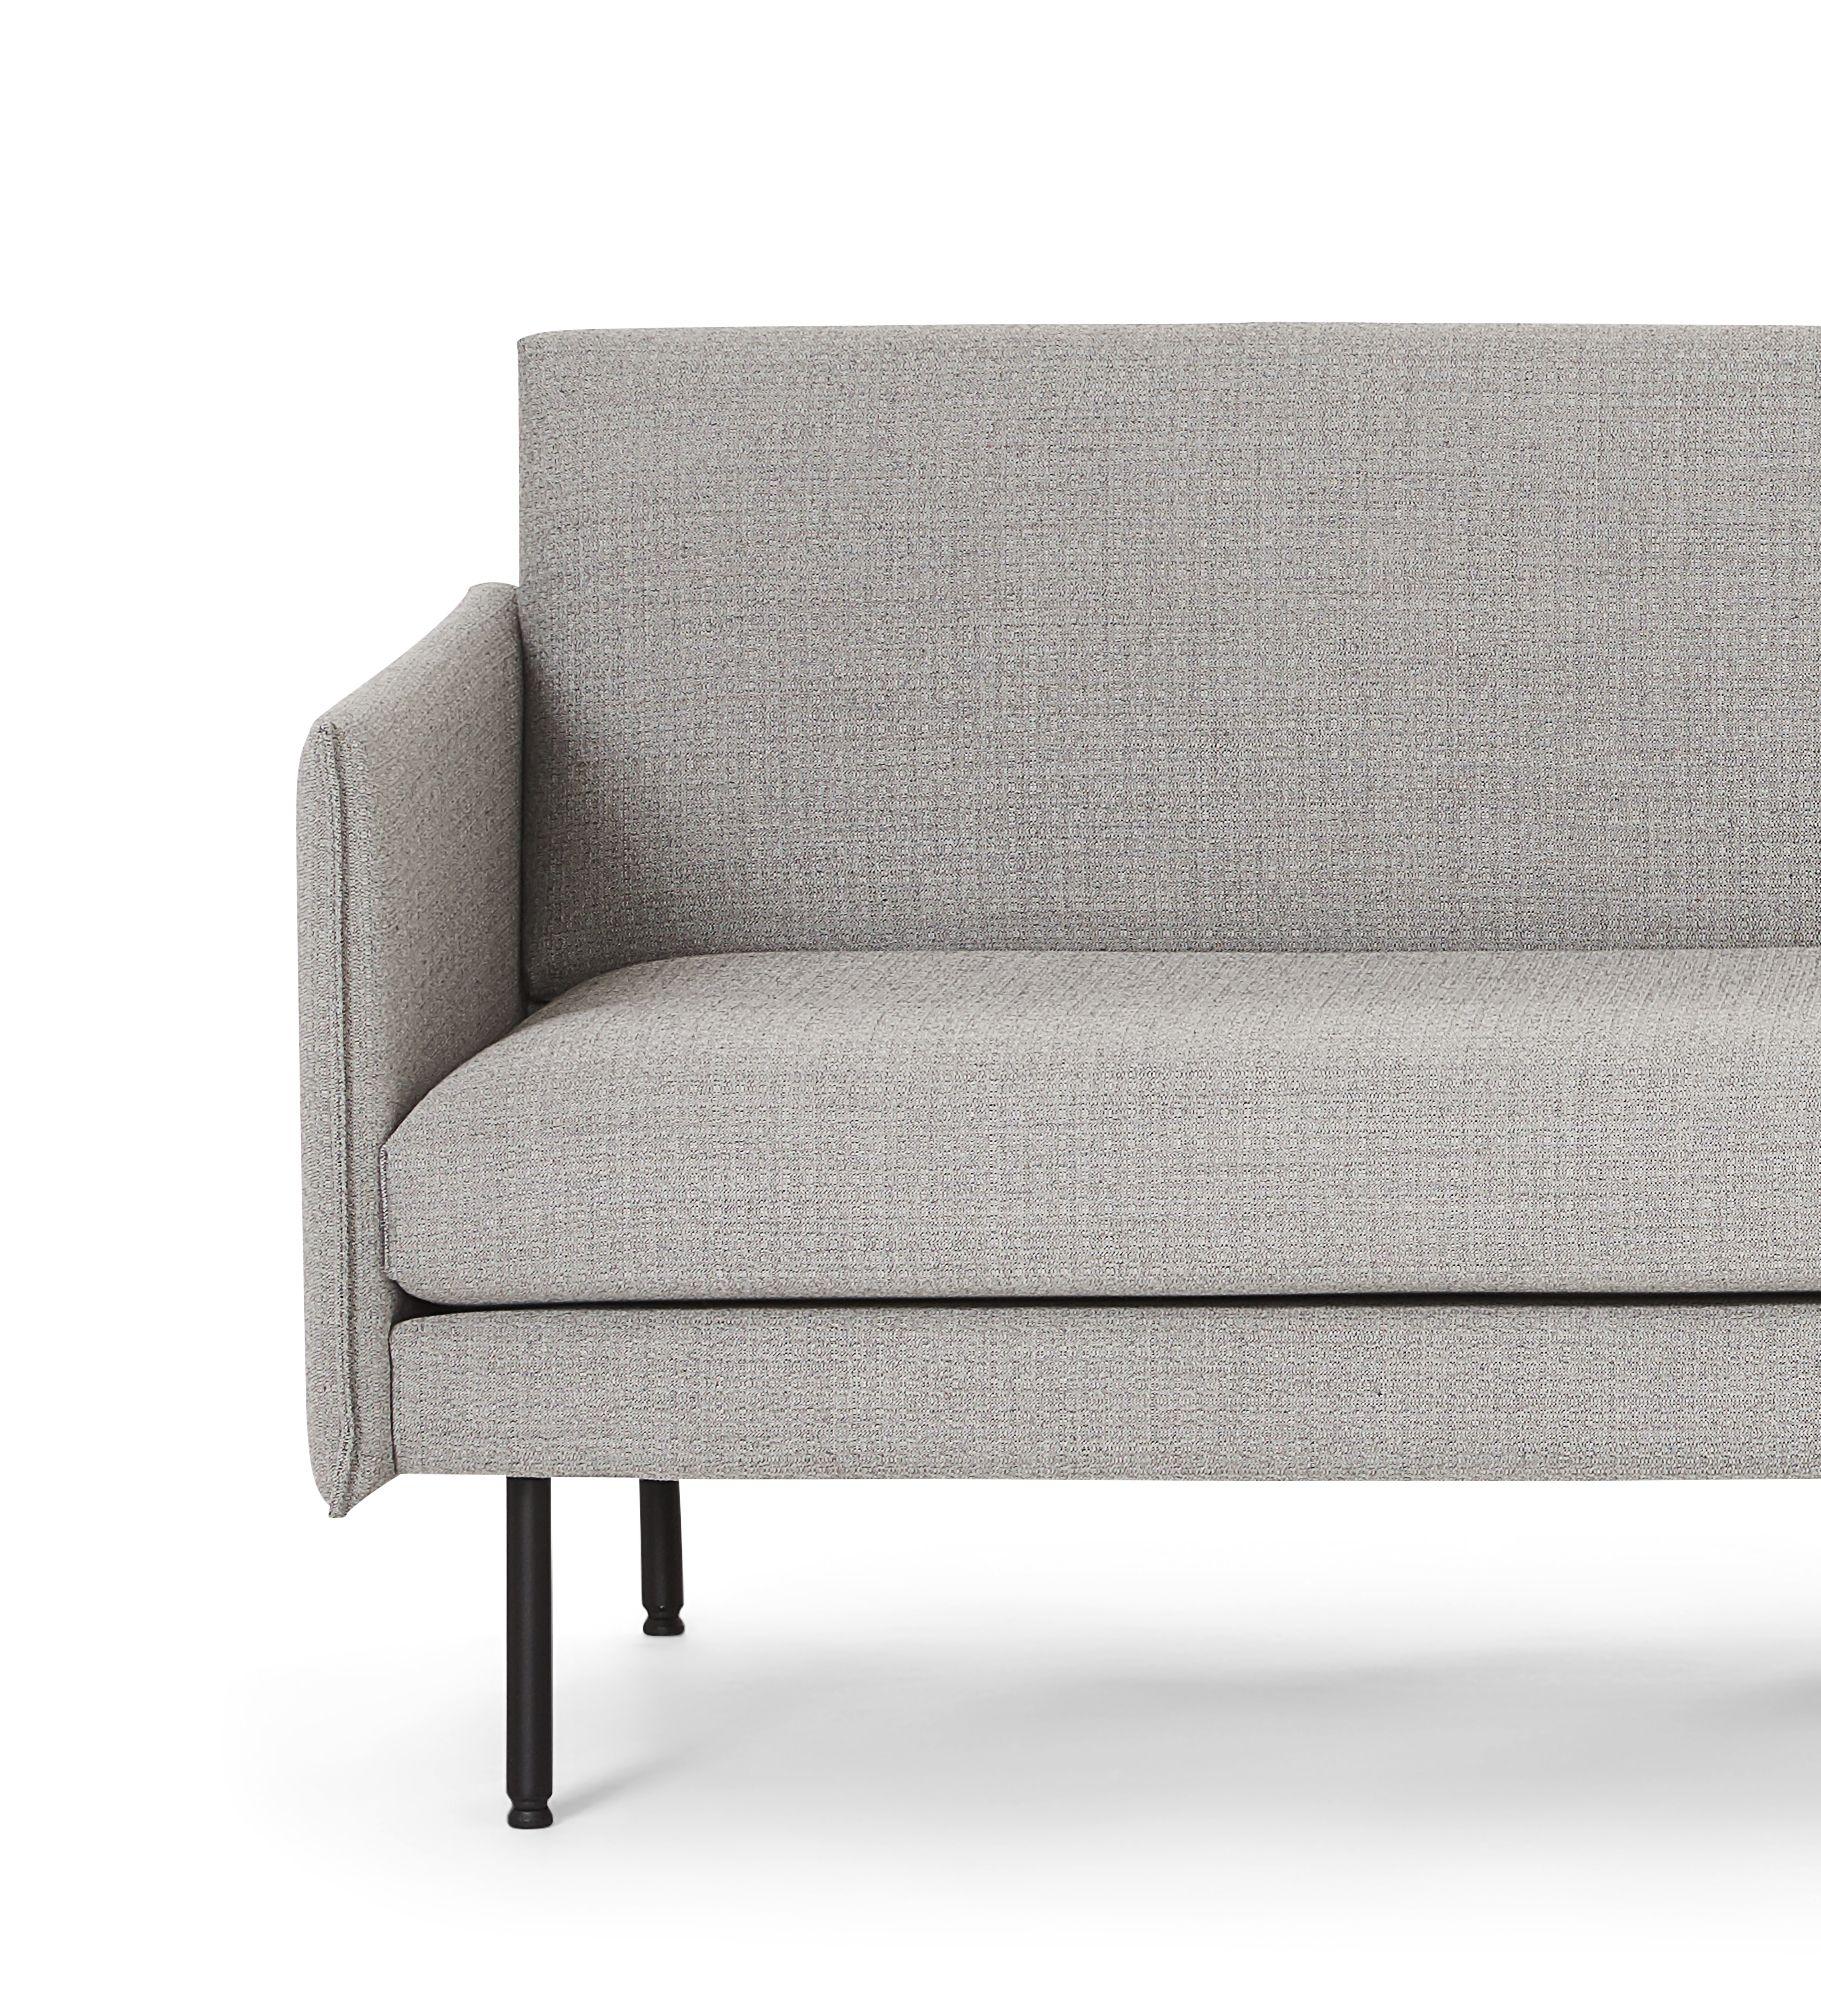 Form Sofa Danish Design Sofa Danish Furniture